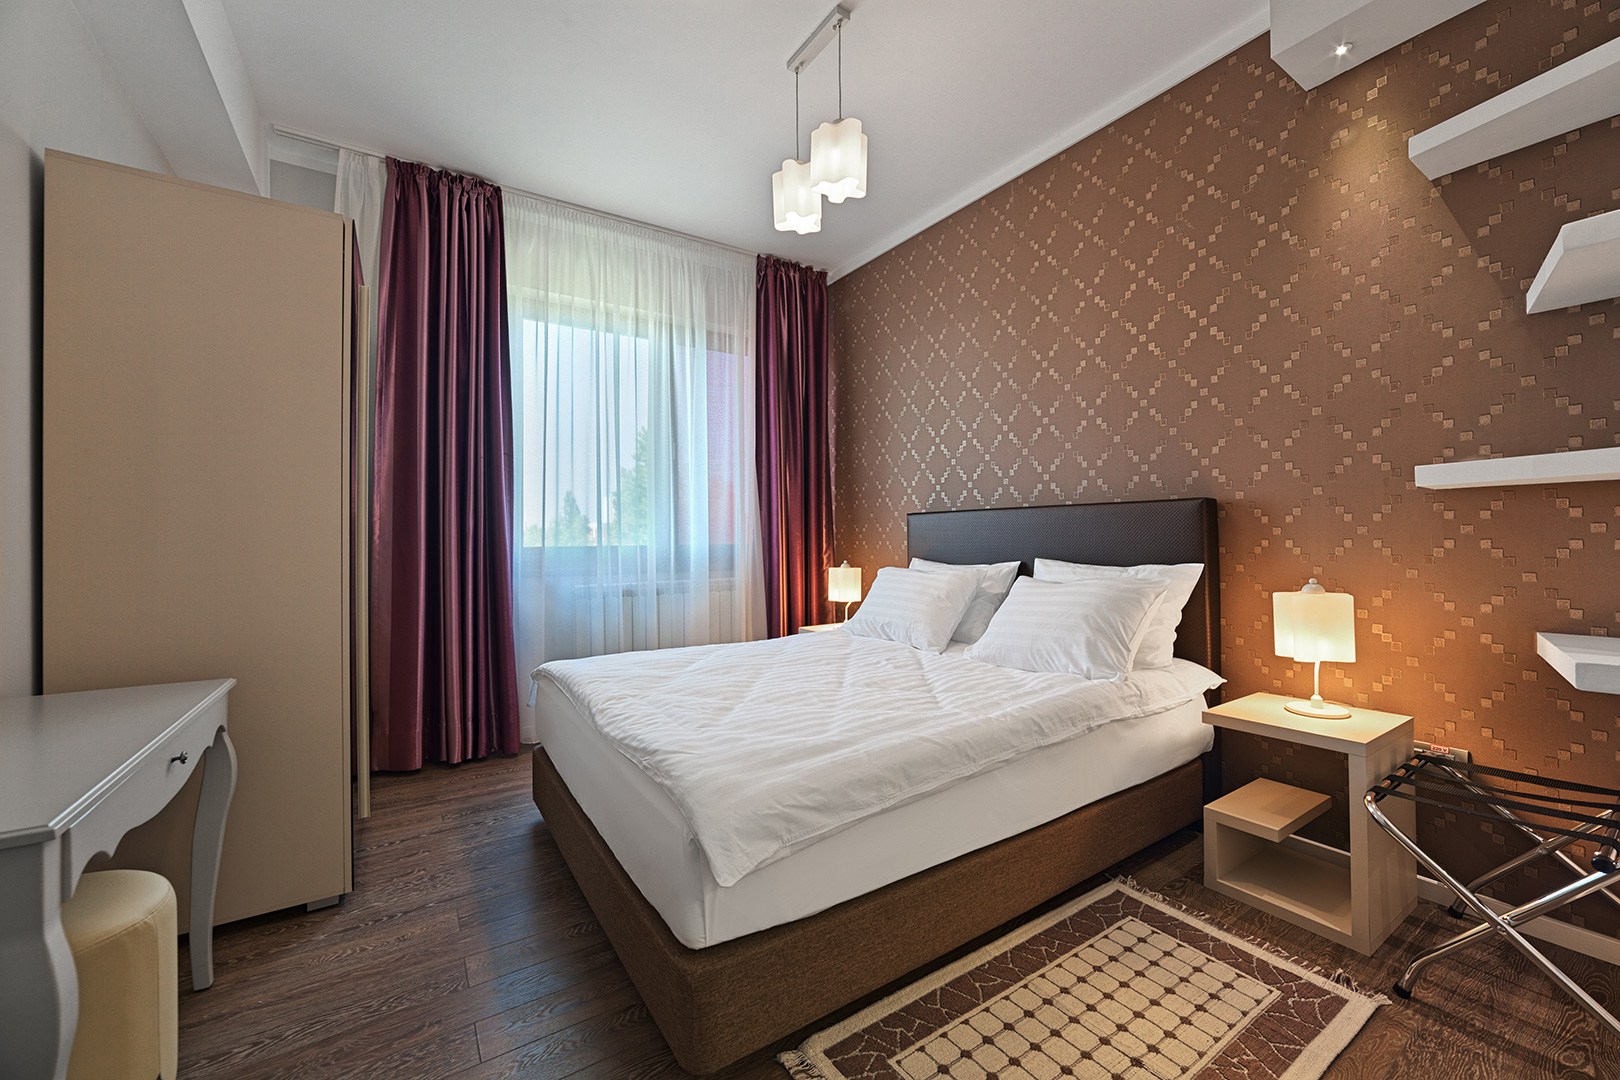 Inchiriere apartament Mamaia - Statiune